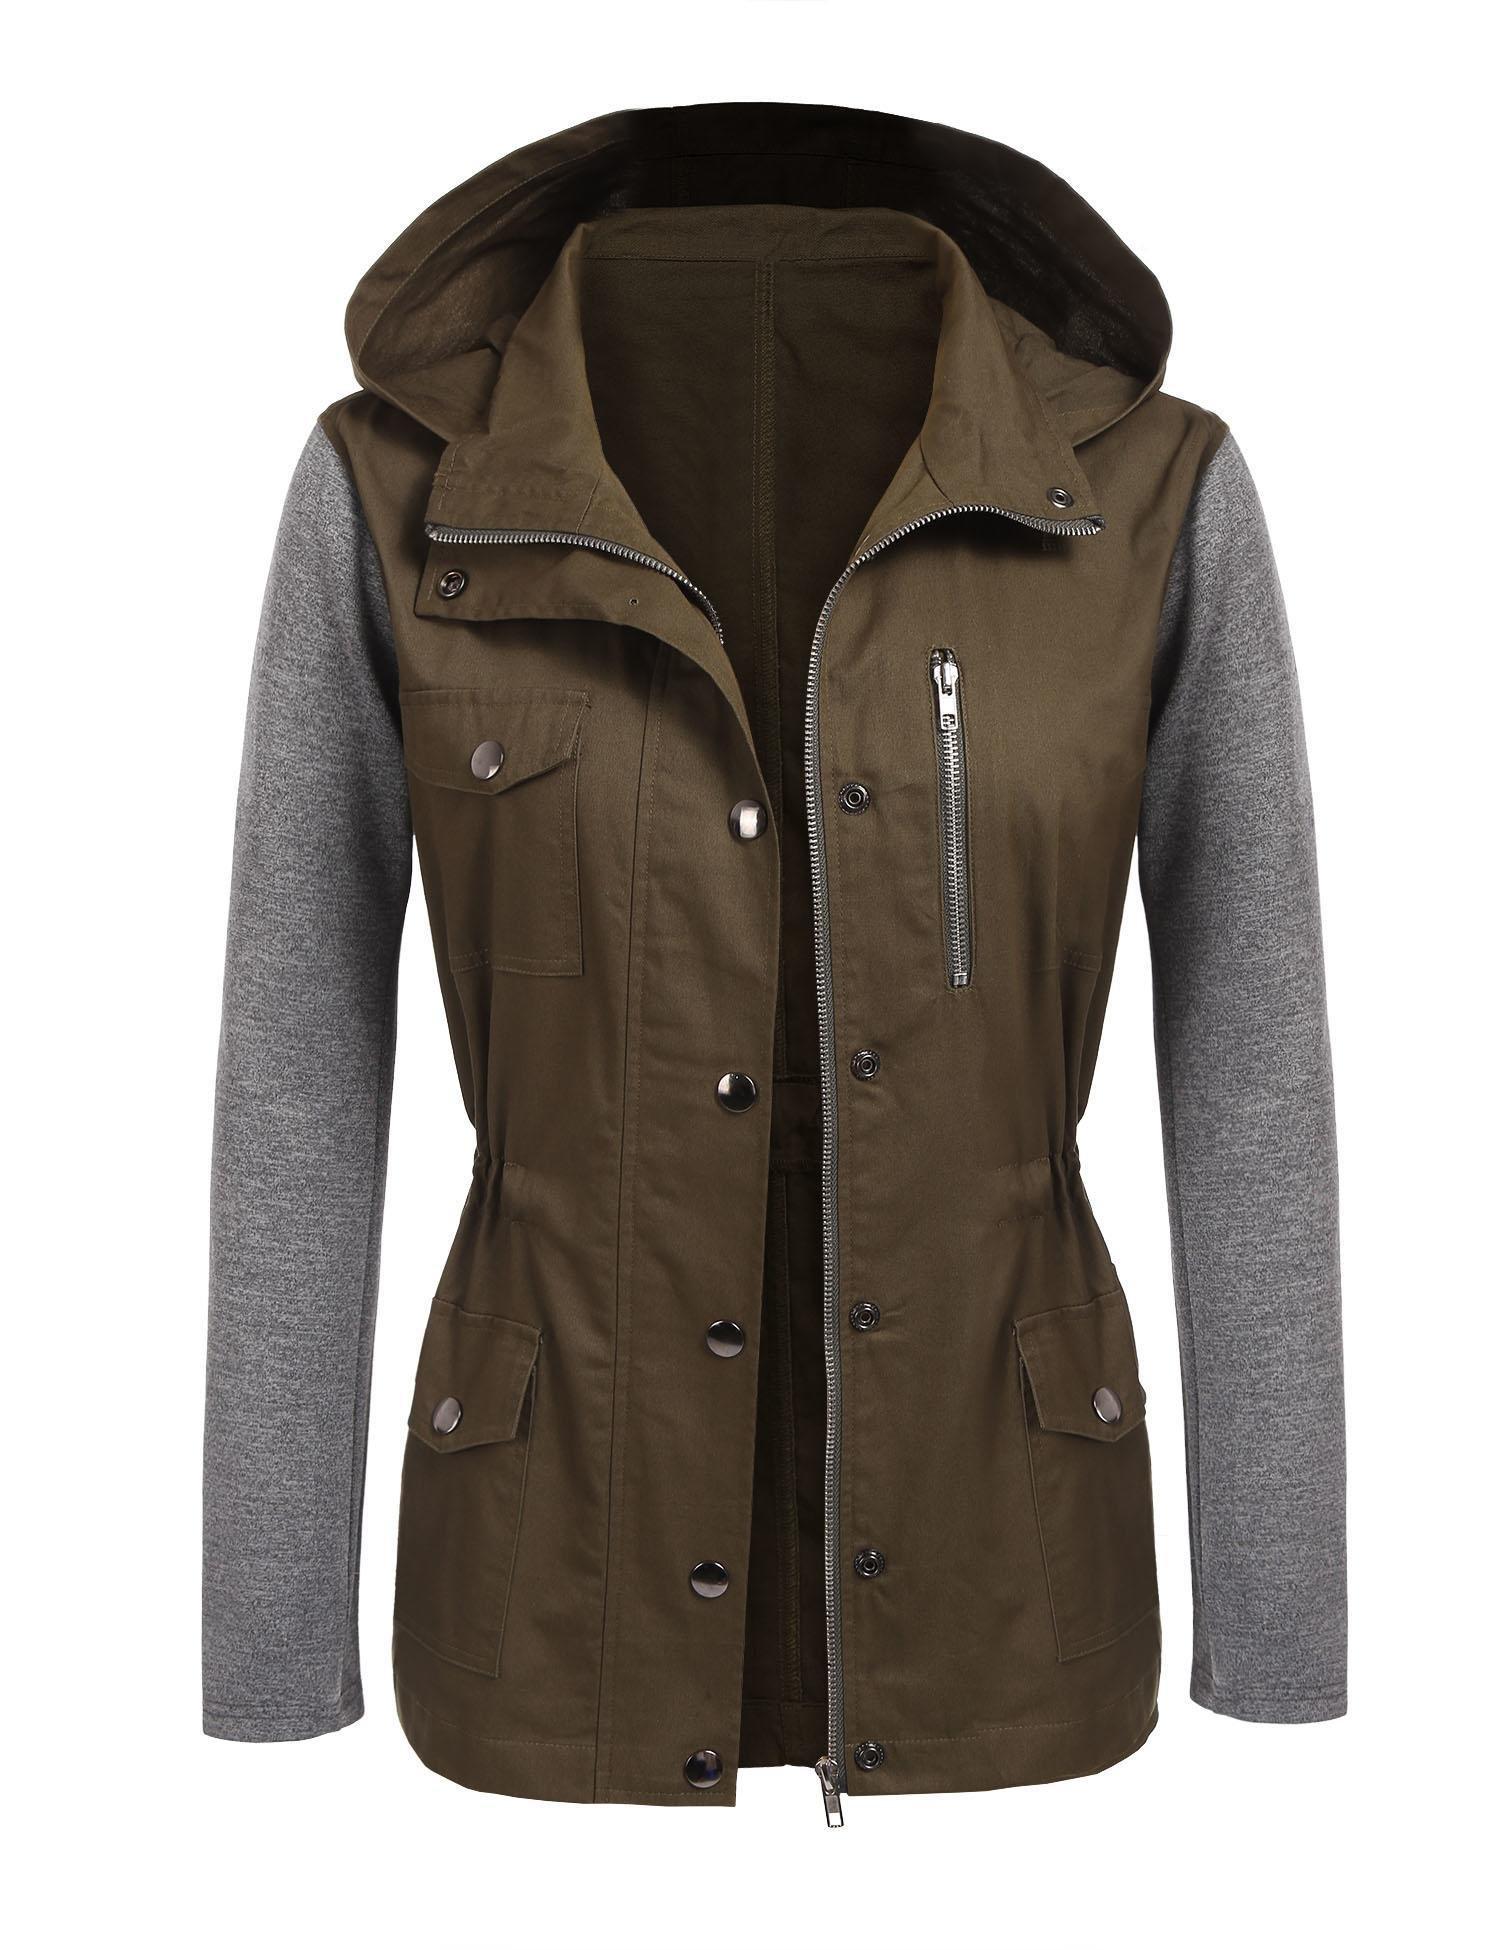 Beyove Womens Spring Jacket Military Anorak Safari Utility Drawstring Hoodie Jacket by Beyove